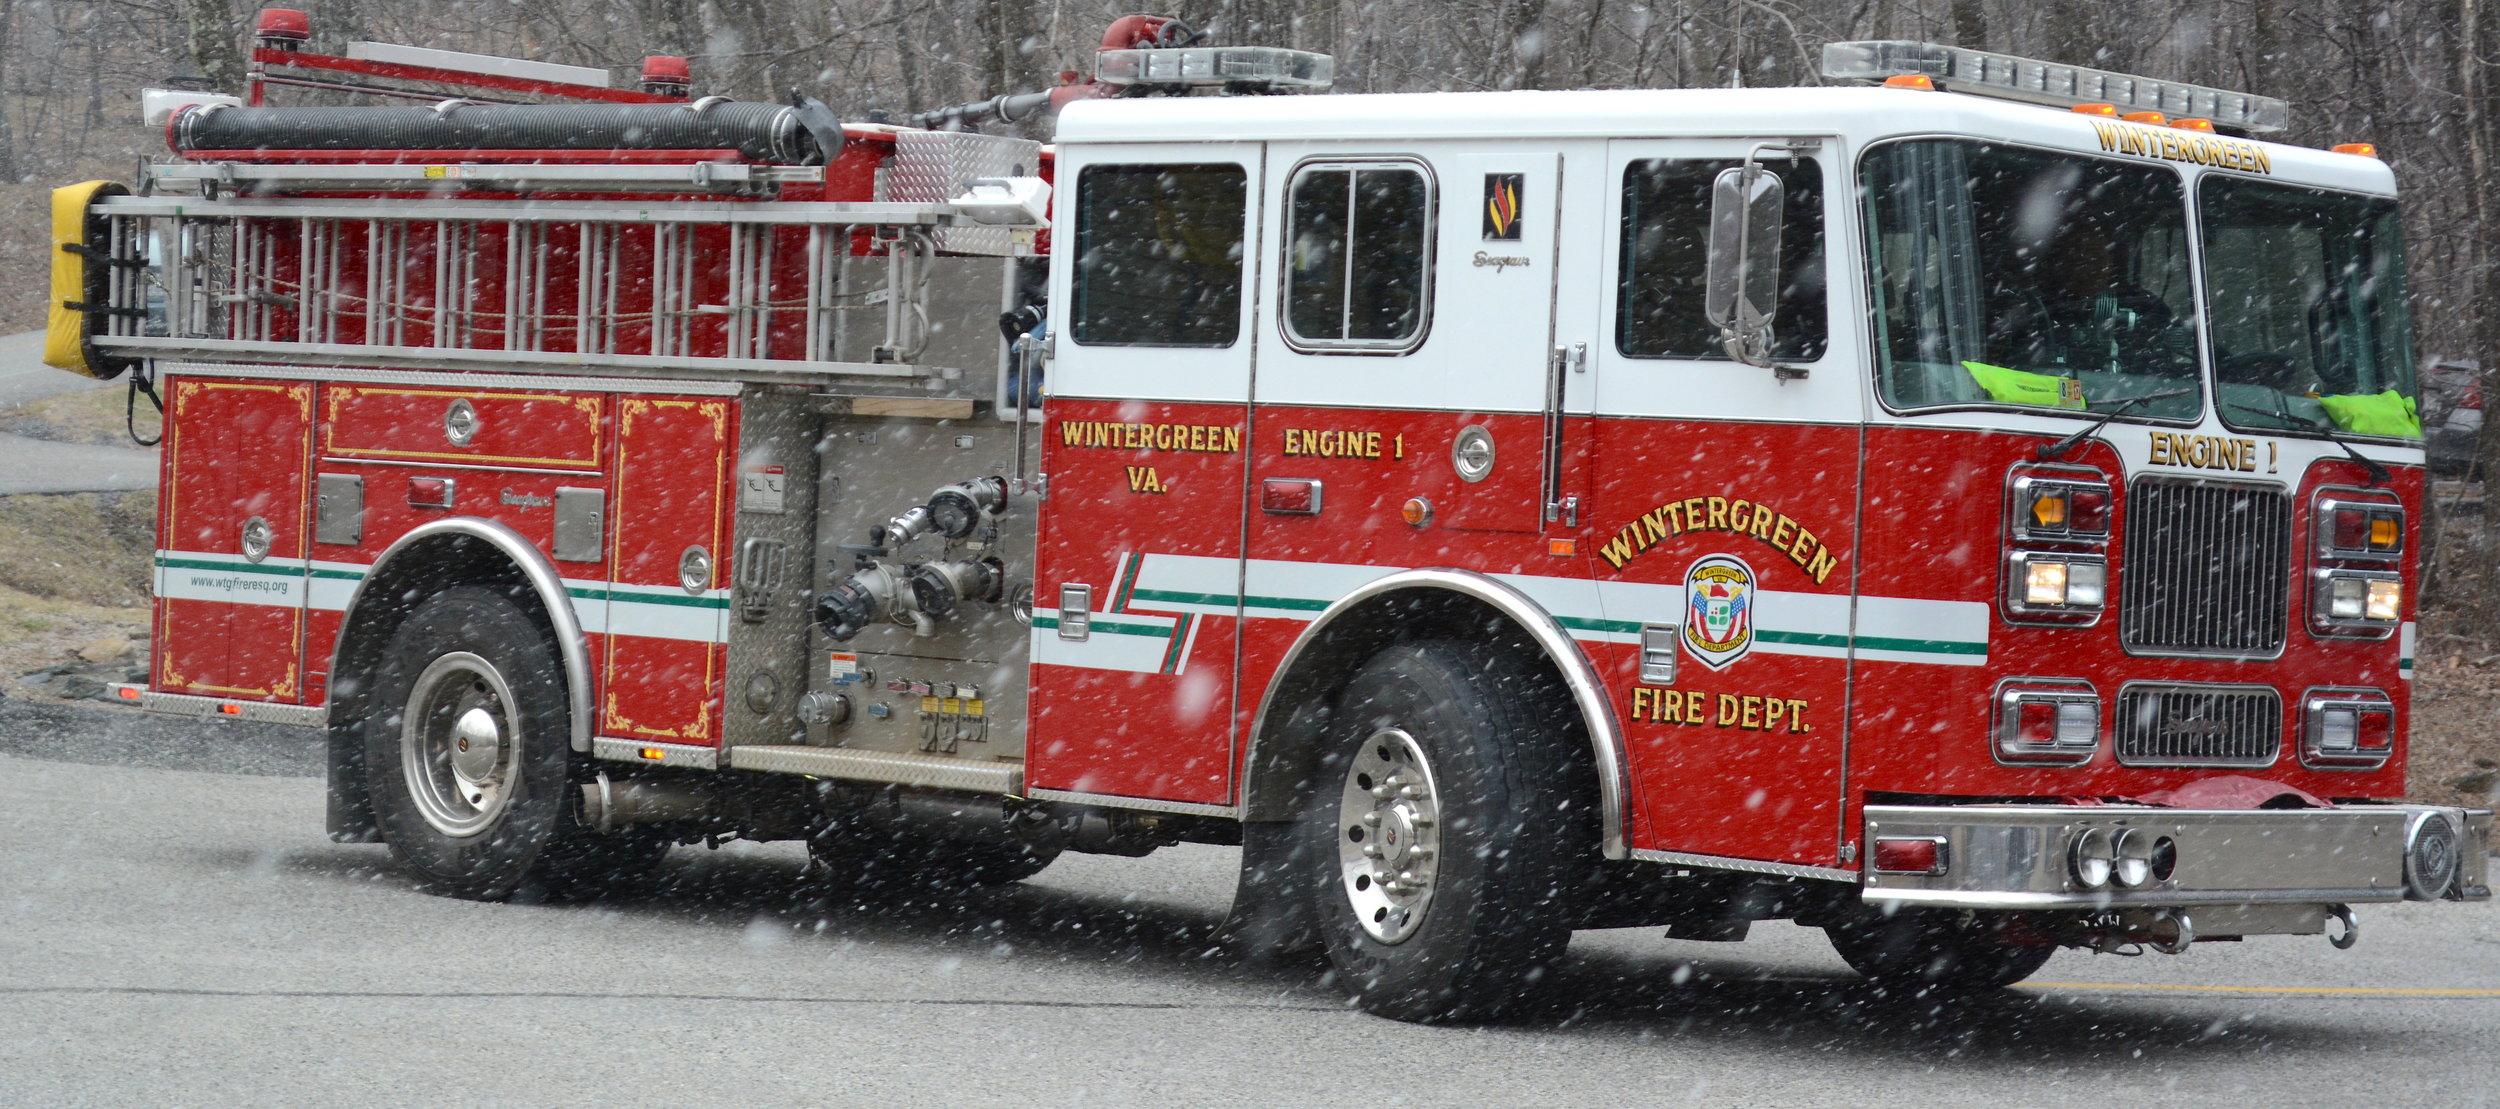 Engine 61  - 2003 Seagrave Marauder II, 1500 GPM Waterous Pump, Foam A/B, Detroit Series 60 515hp Engine, Automatic Snow Chains.